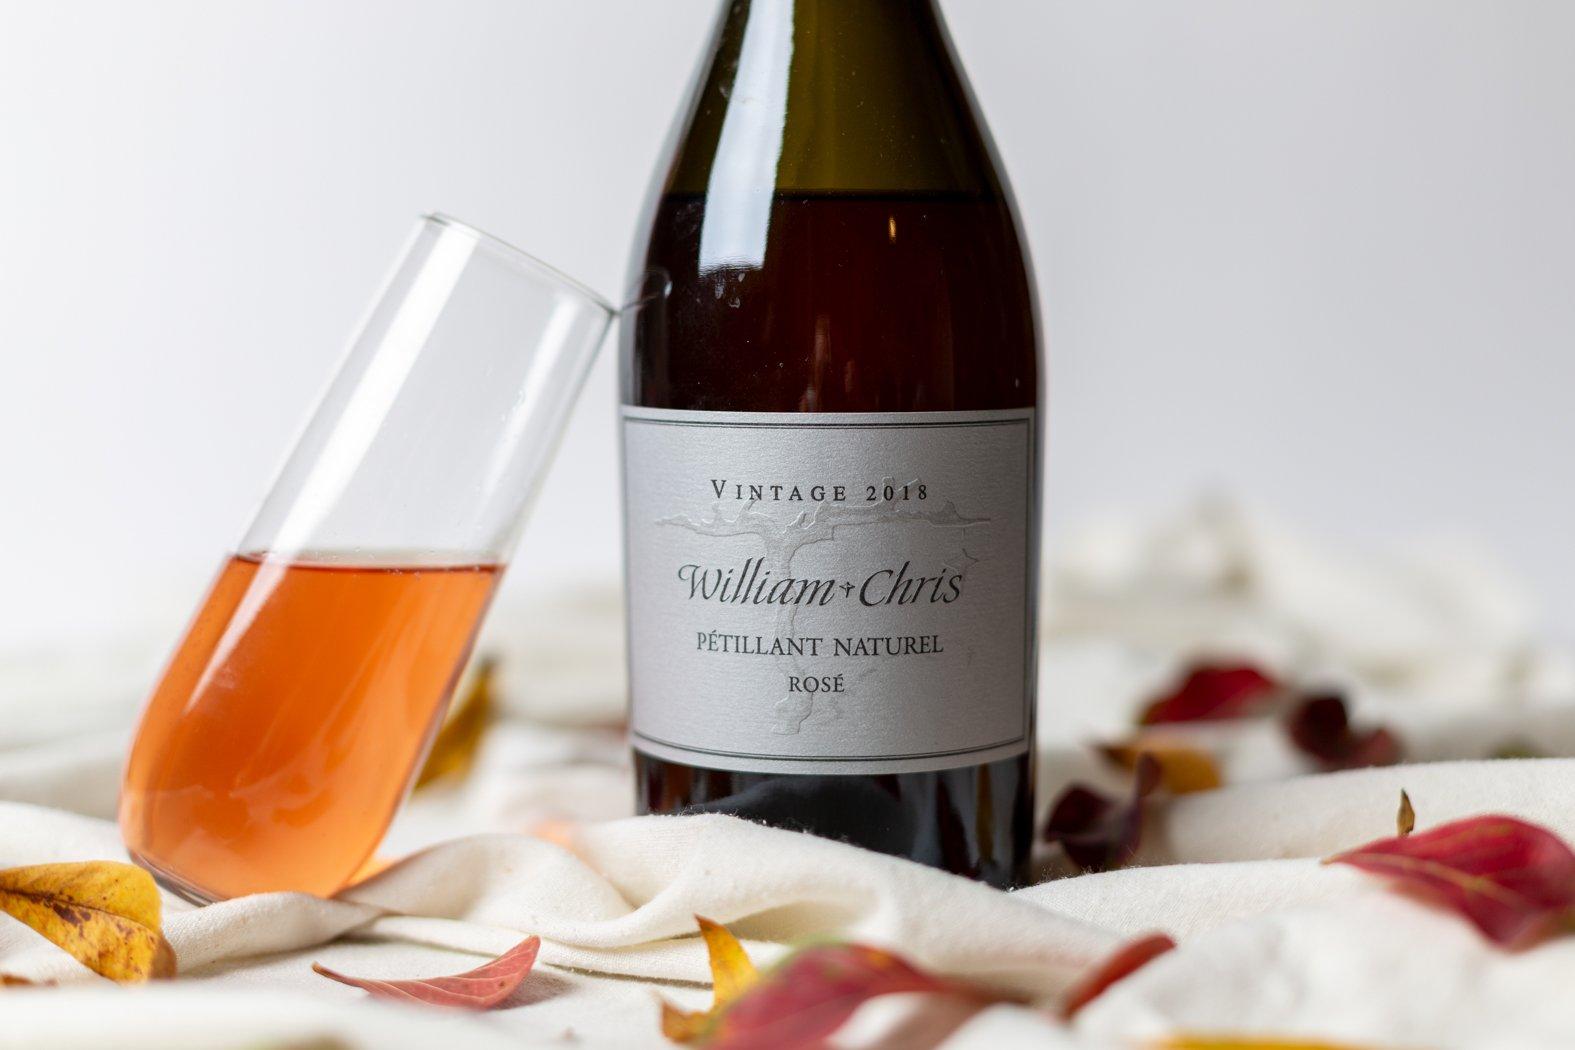 2018 Pétillant Naturel Sparkling Rosé